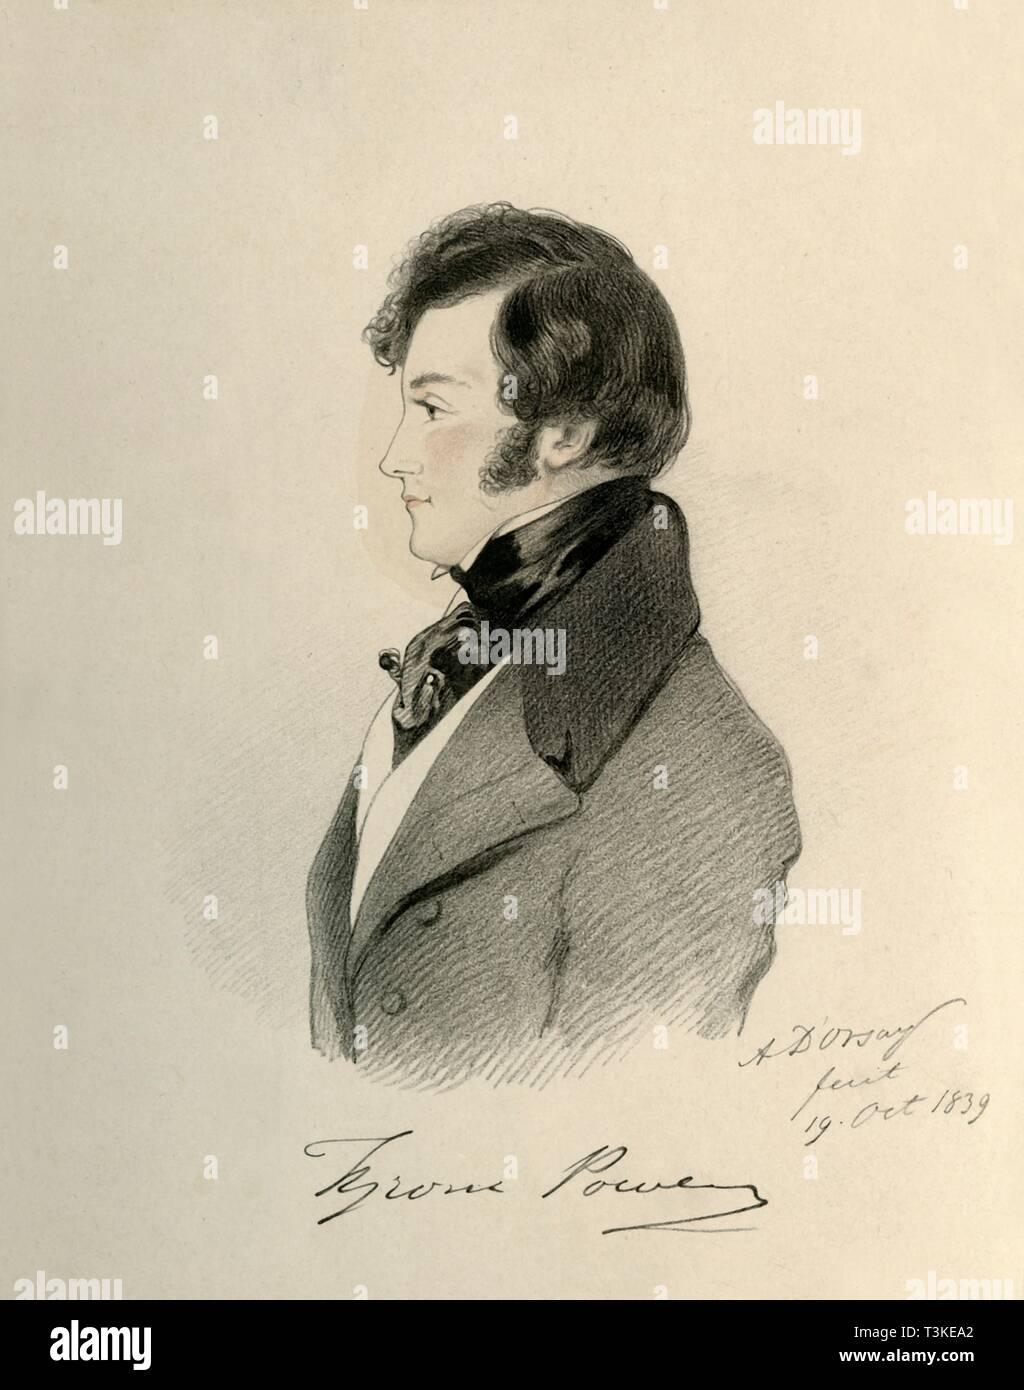 'Tyrone Power', 1839. Creator: Richard James Lane. - Stock Image